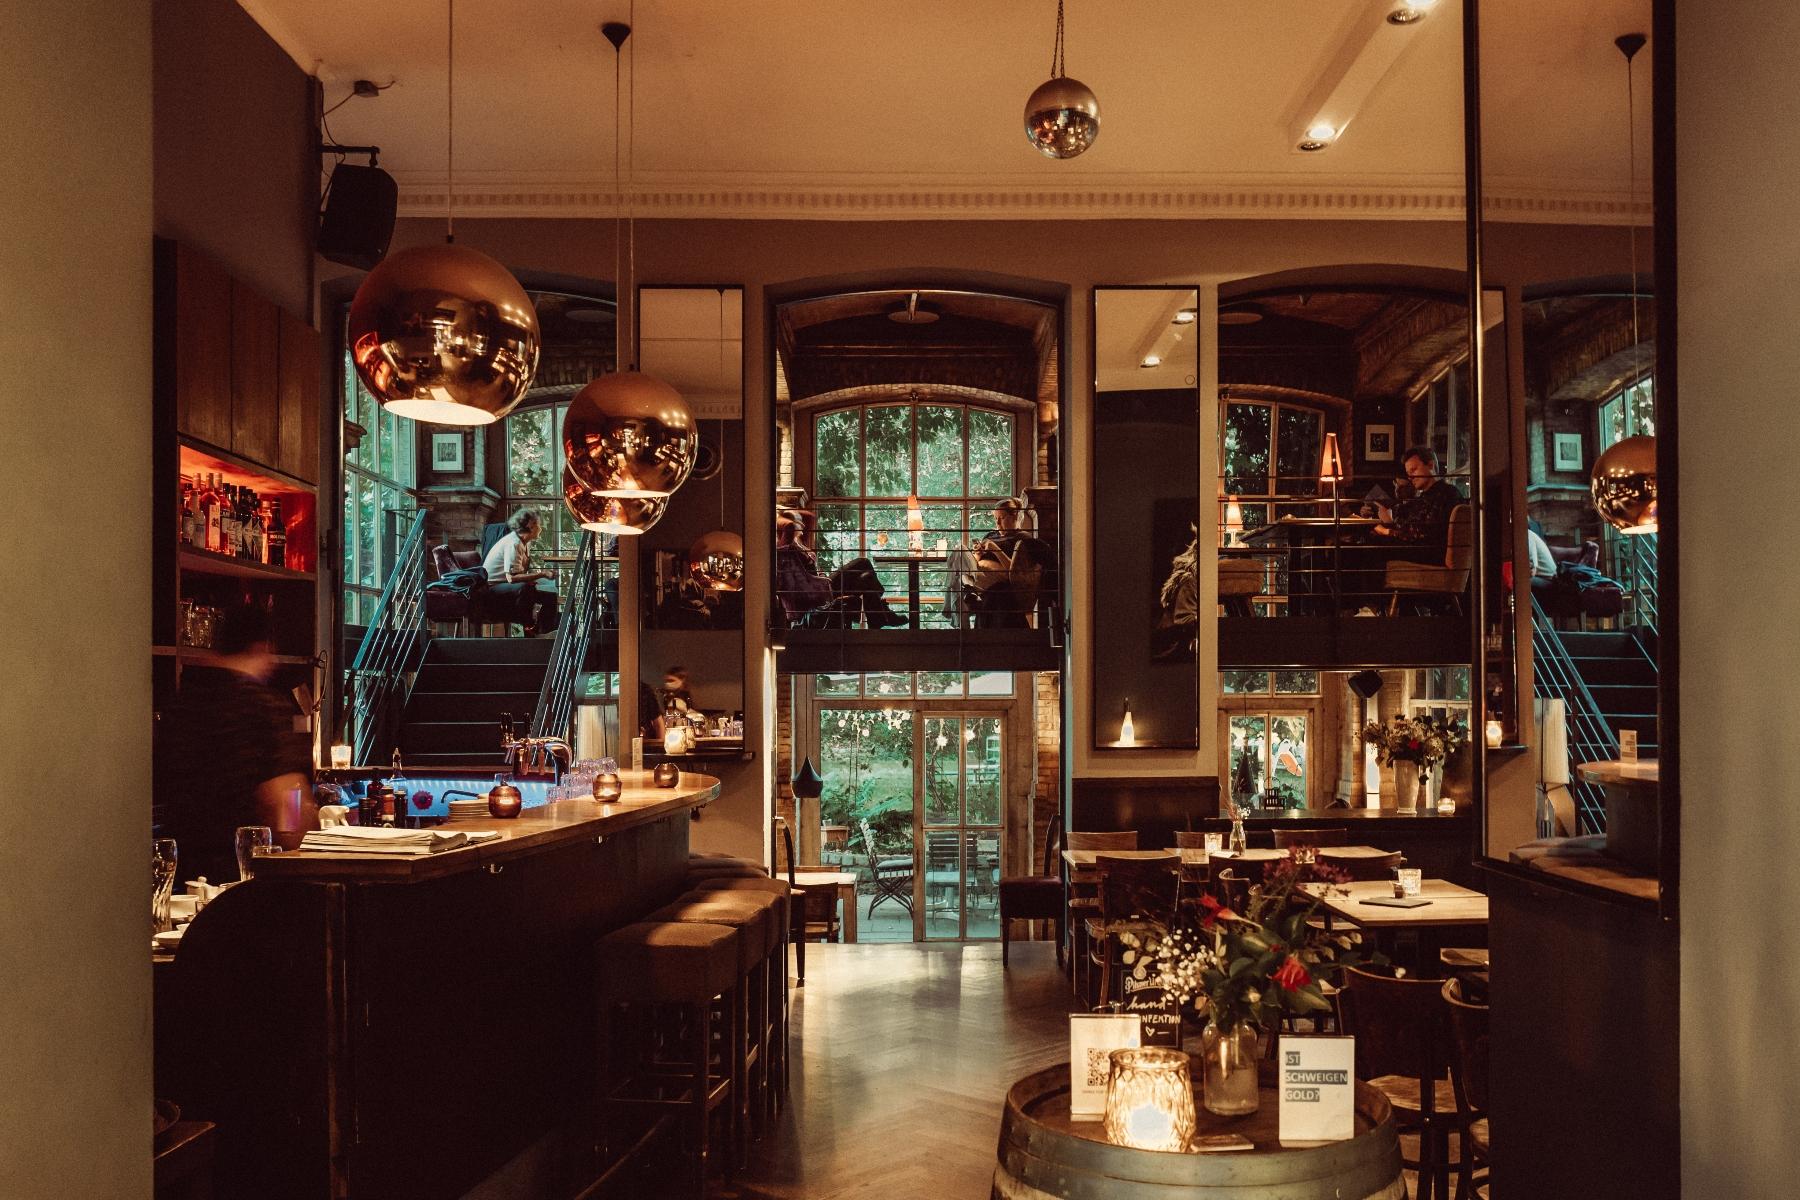 Geheimtipp Hamburg Essen & Trinken Restarant Bar Eimsbüttel Hadleys Lilli Sprung 14